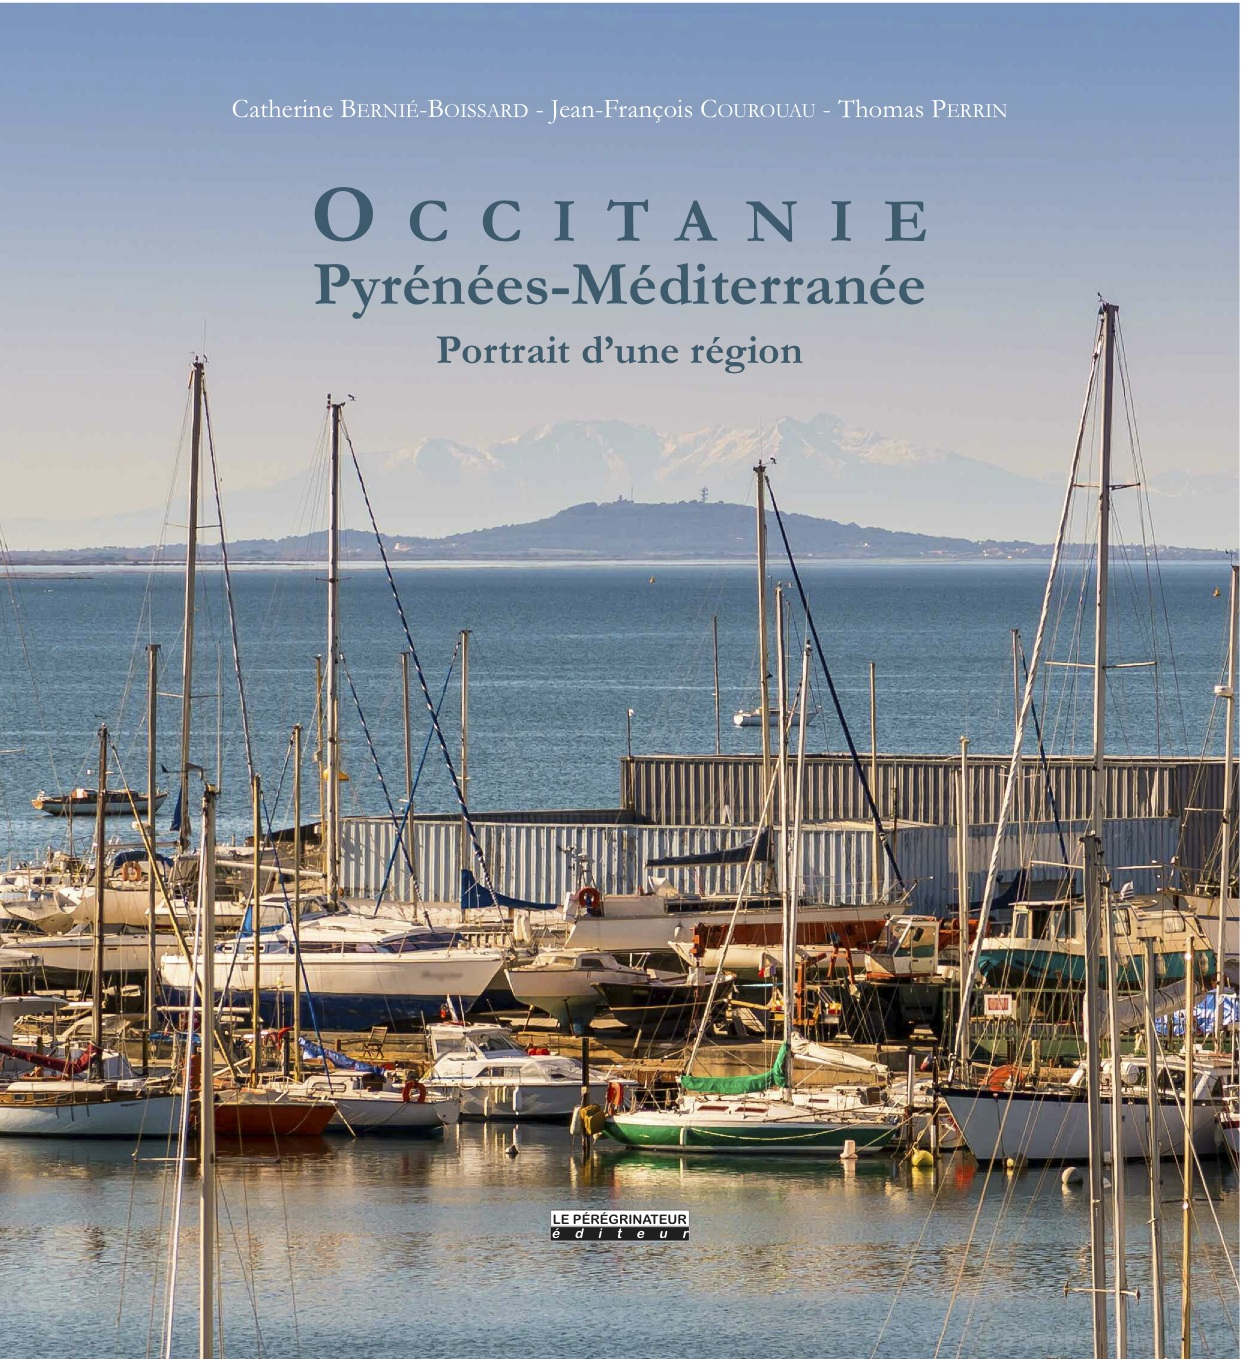 Occitanie Pyrénées-Méditerranée